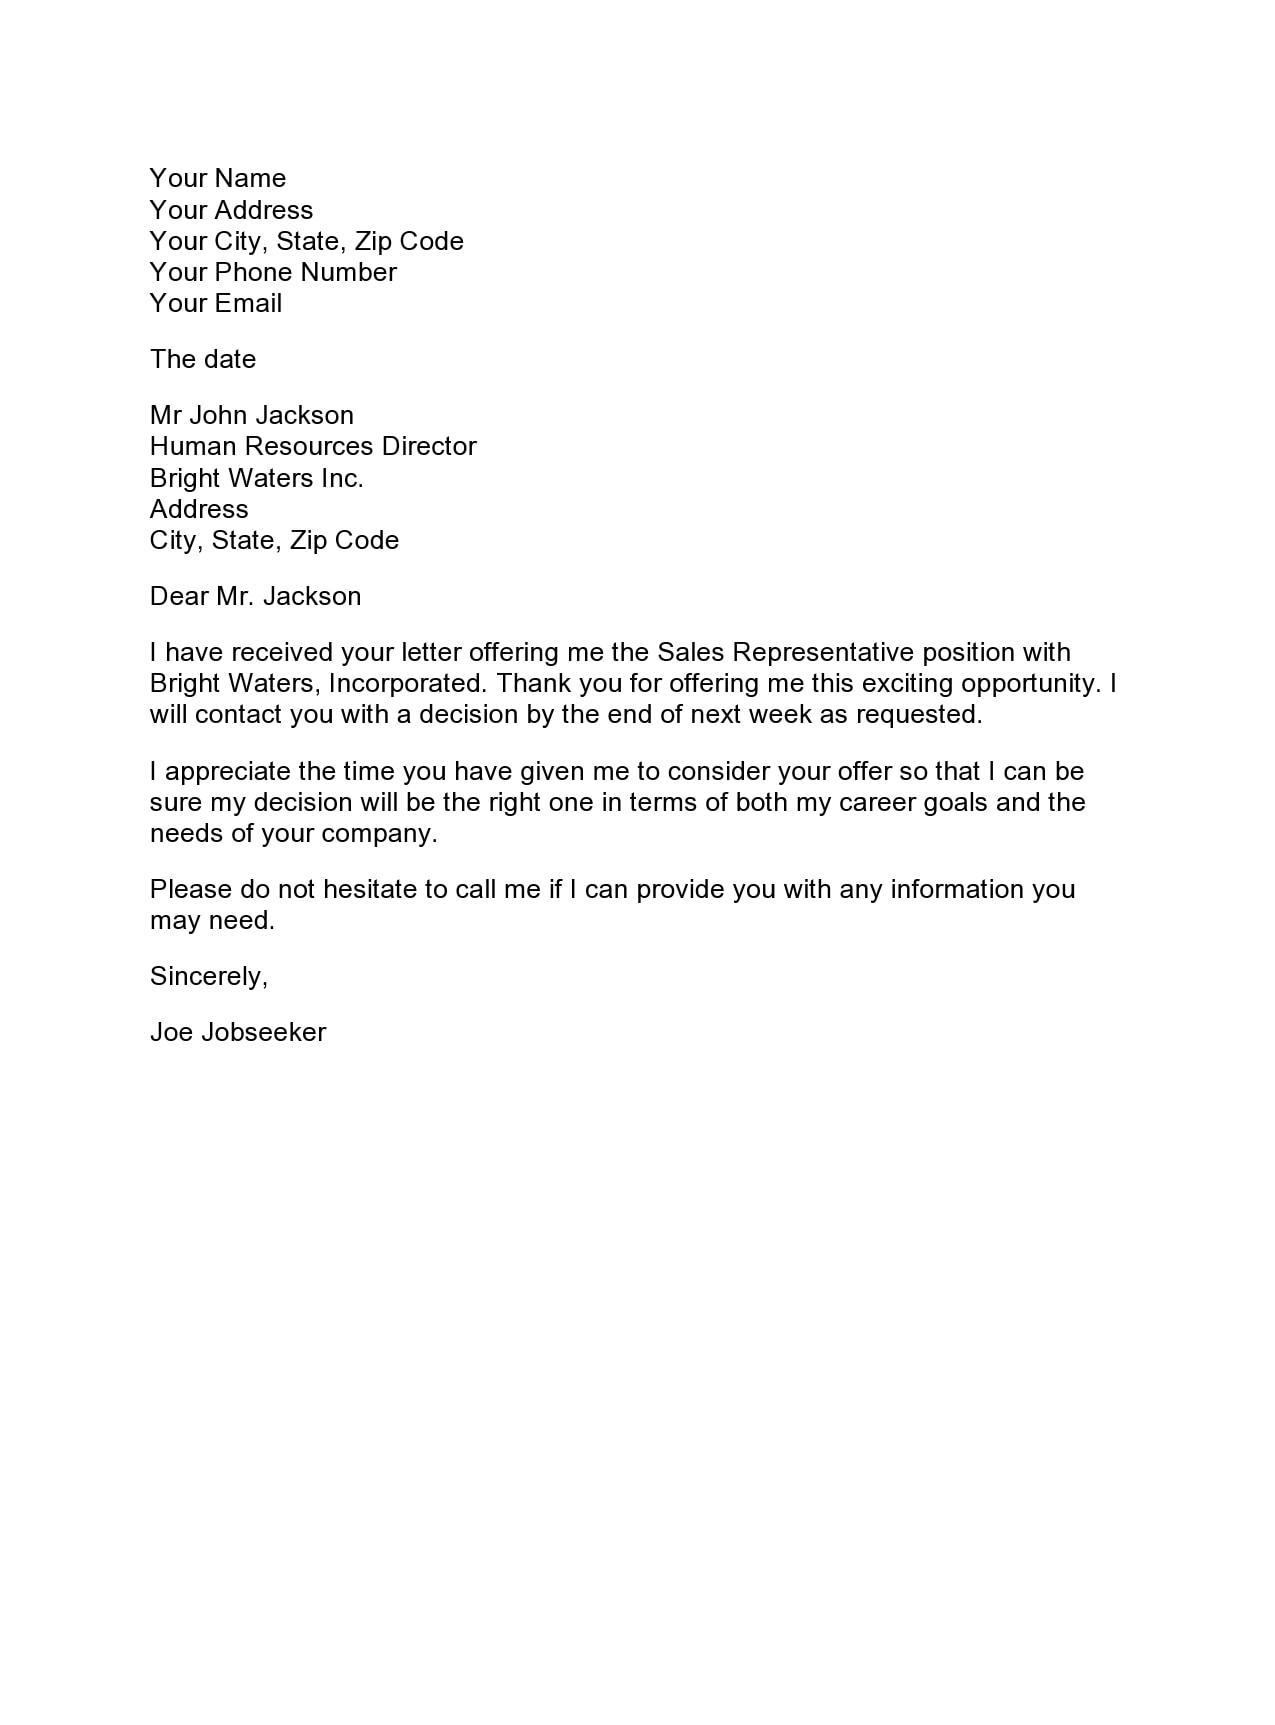 thank you letter for job offer 27